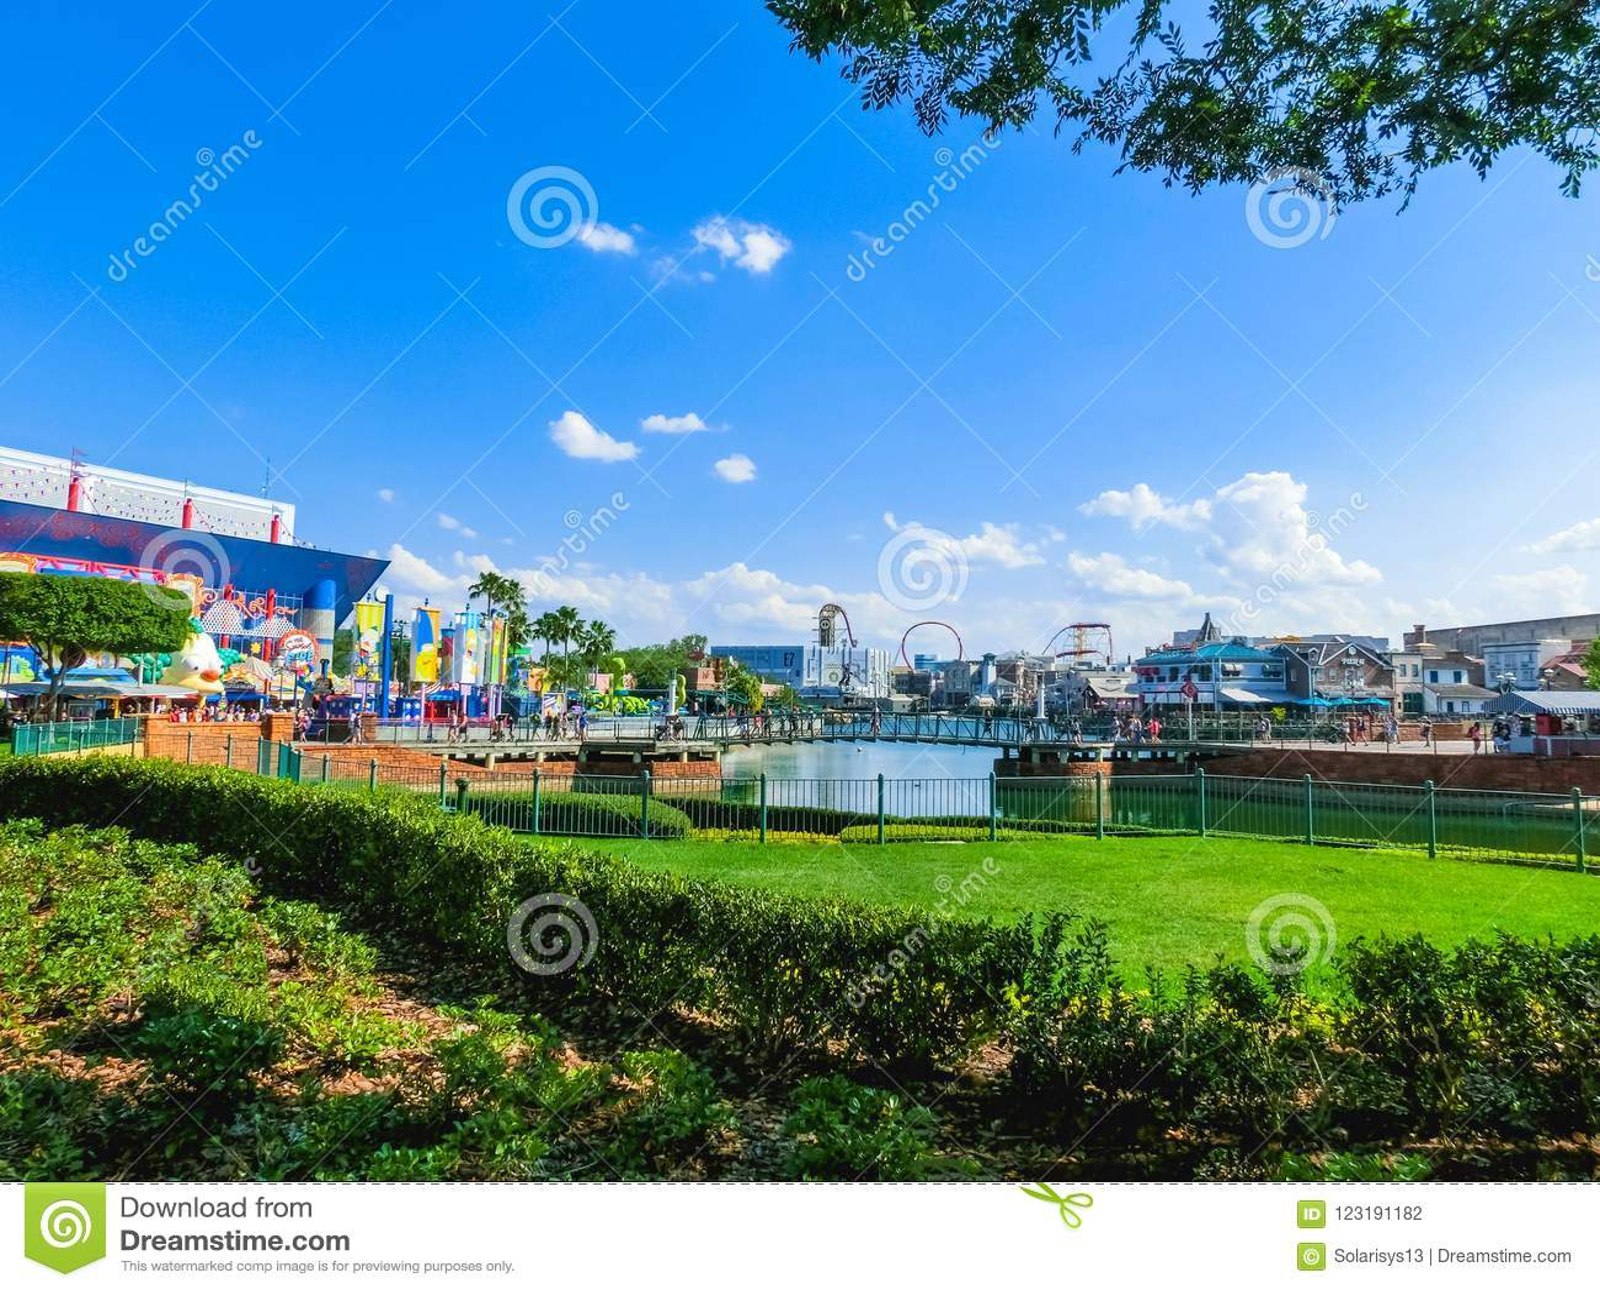 Map Of Universal Studios Florida.Orlando Florida Usa May 10 2018 The Pond At Park Universal